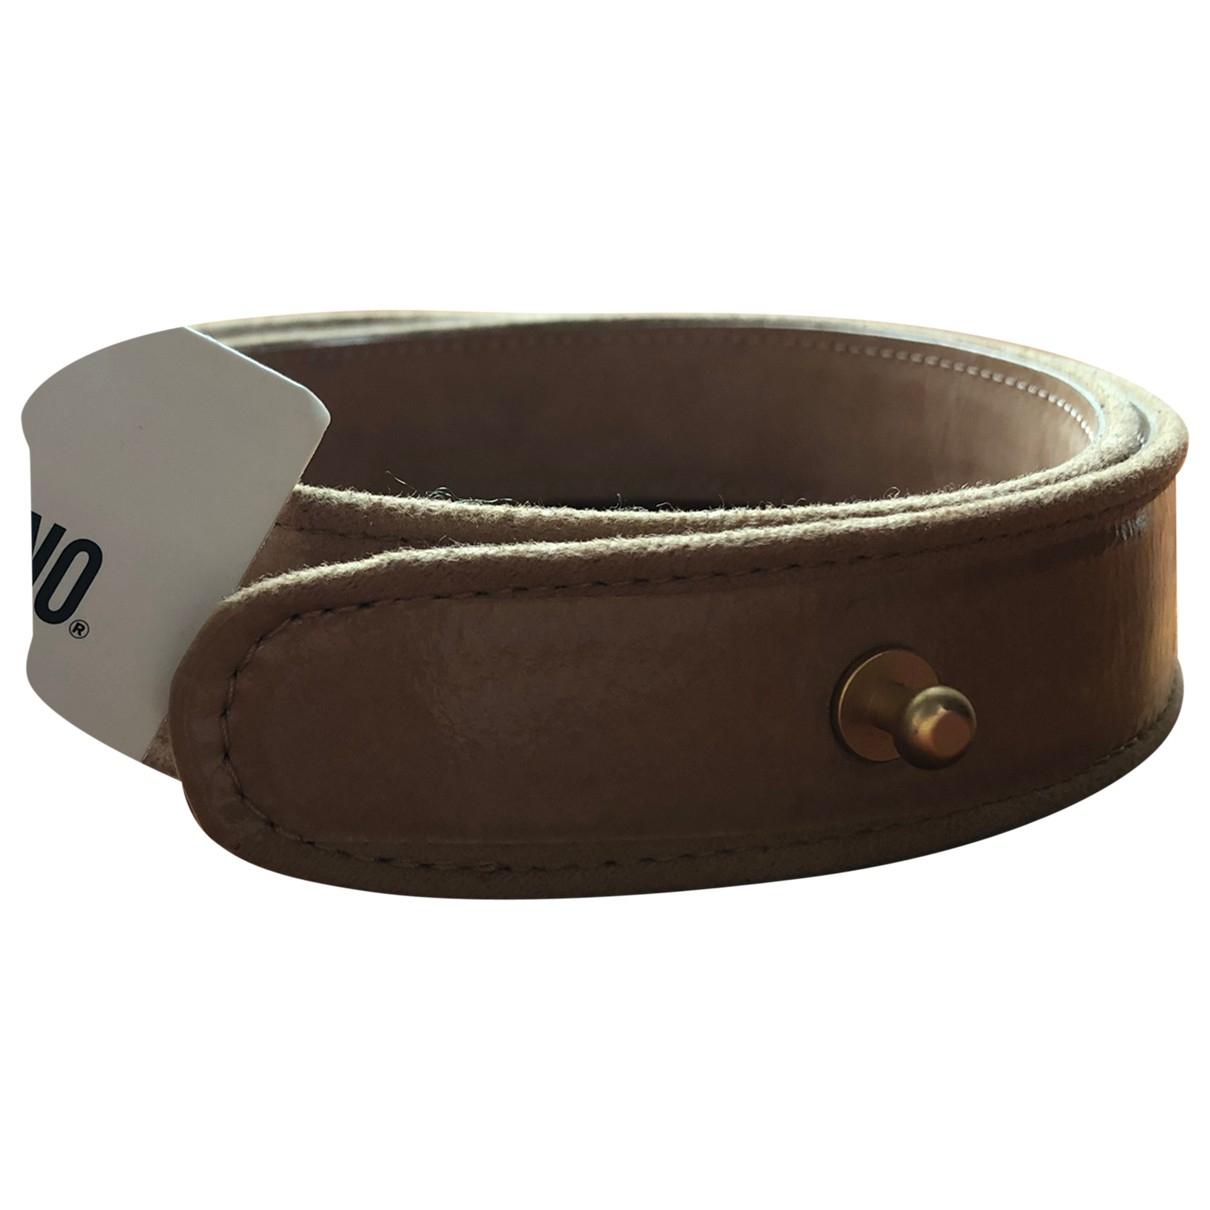 Moschino \N Camel Leather belt for Women M International